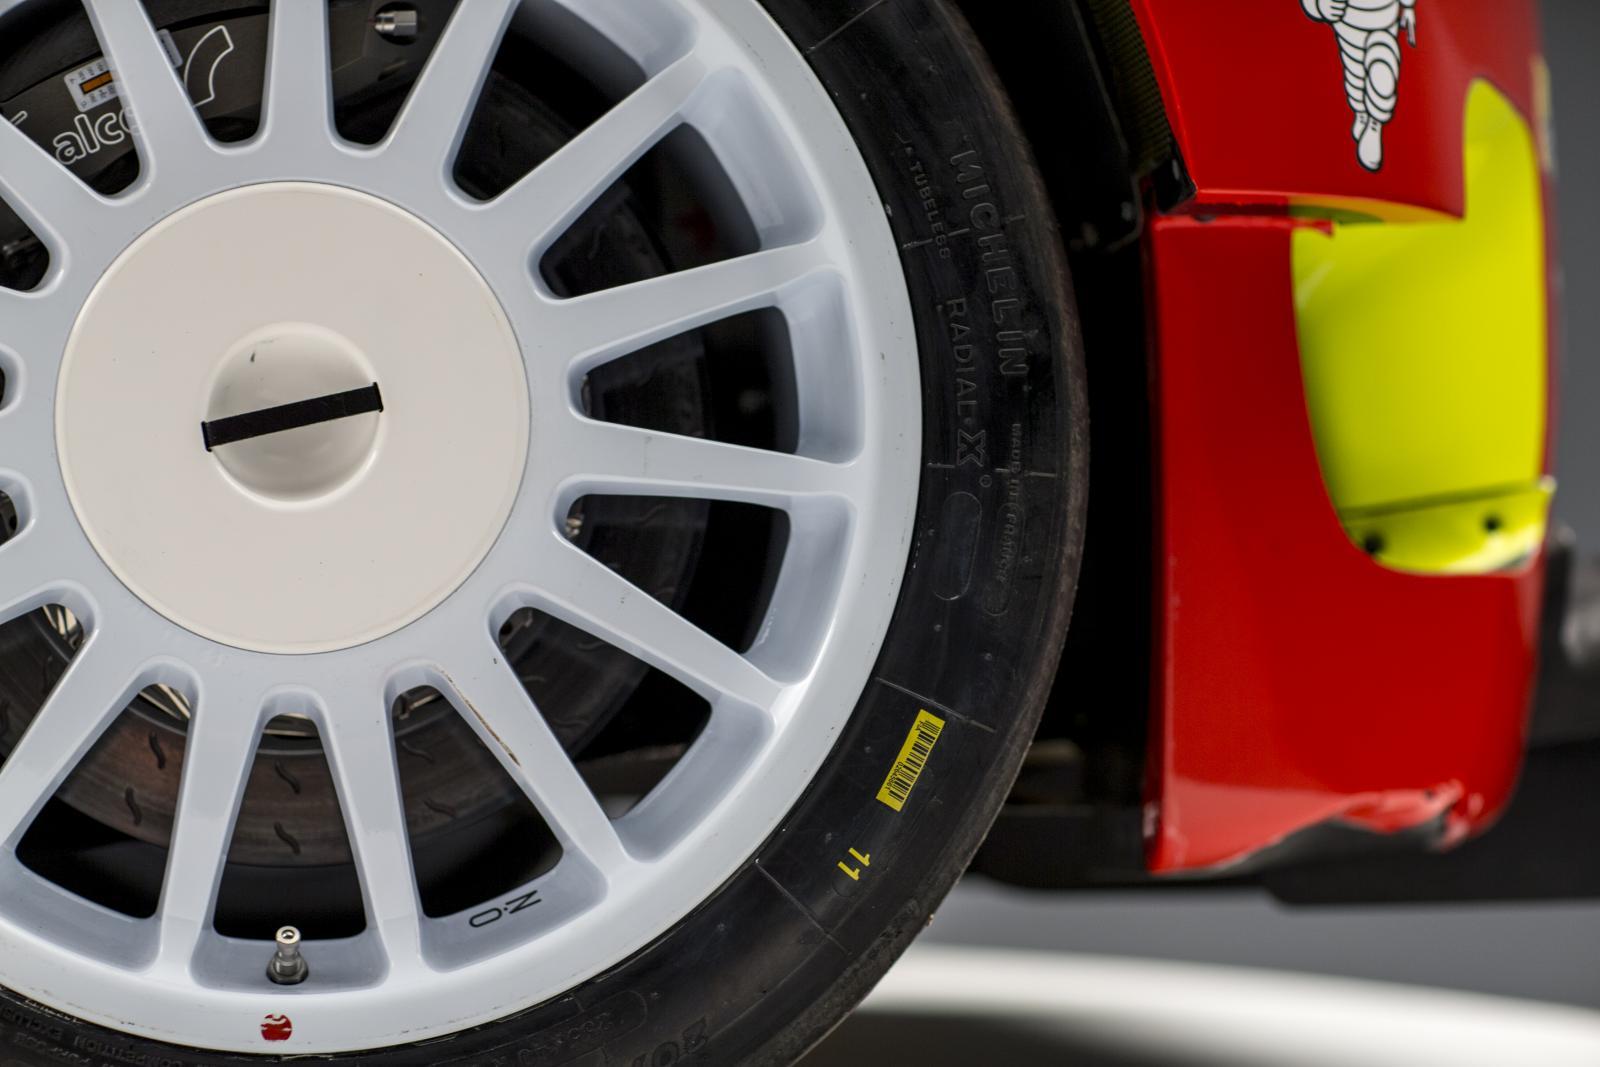 C3 WRC - roue avant